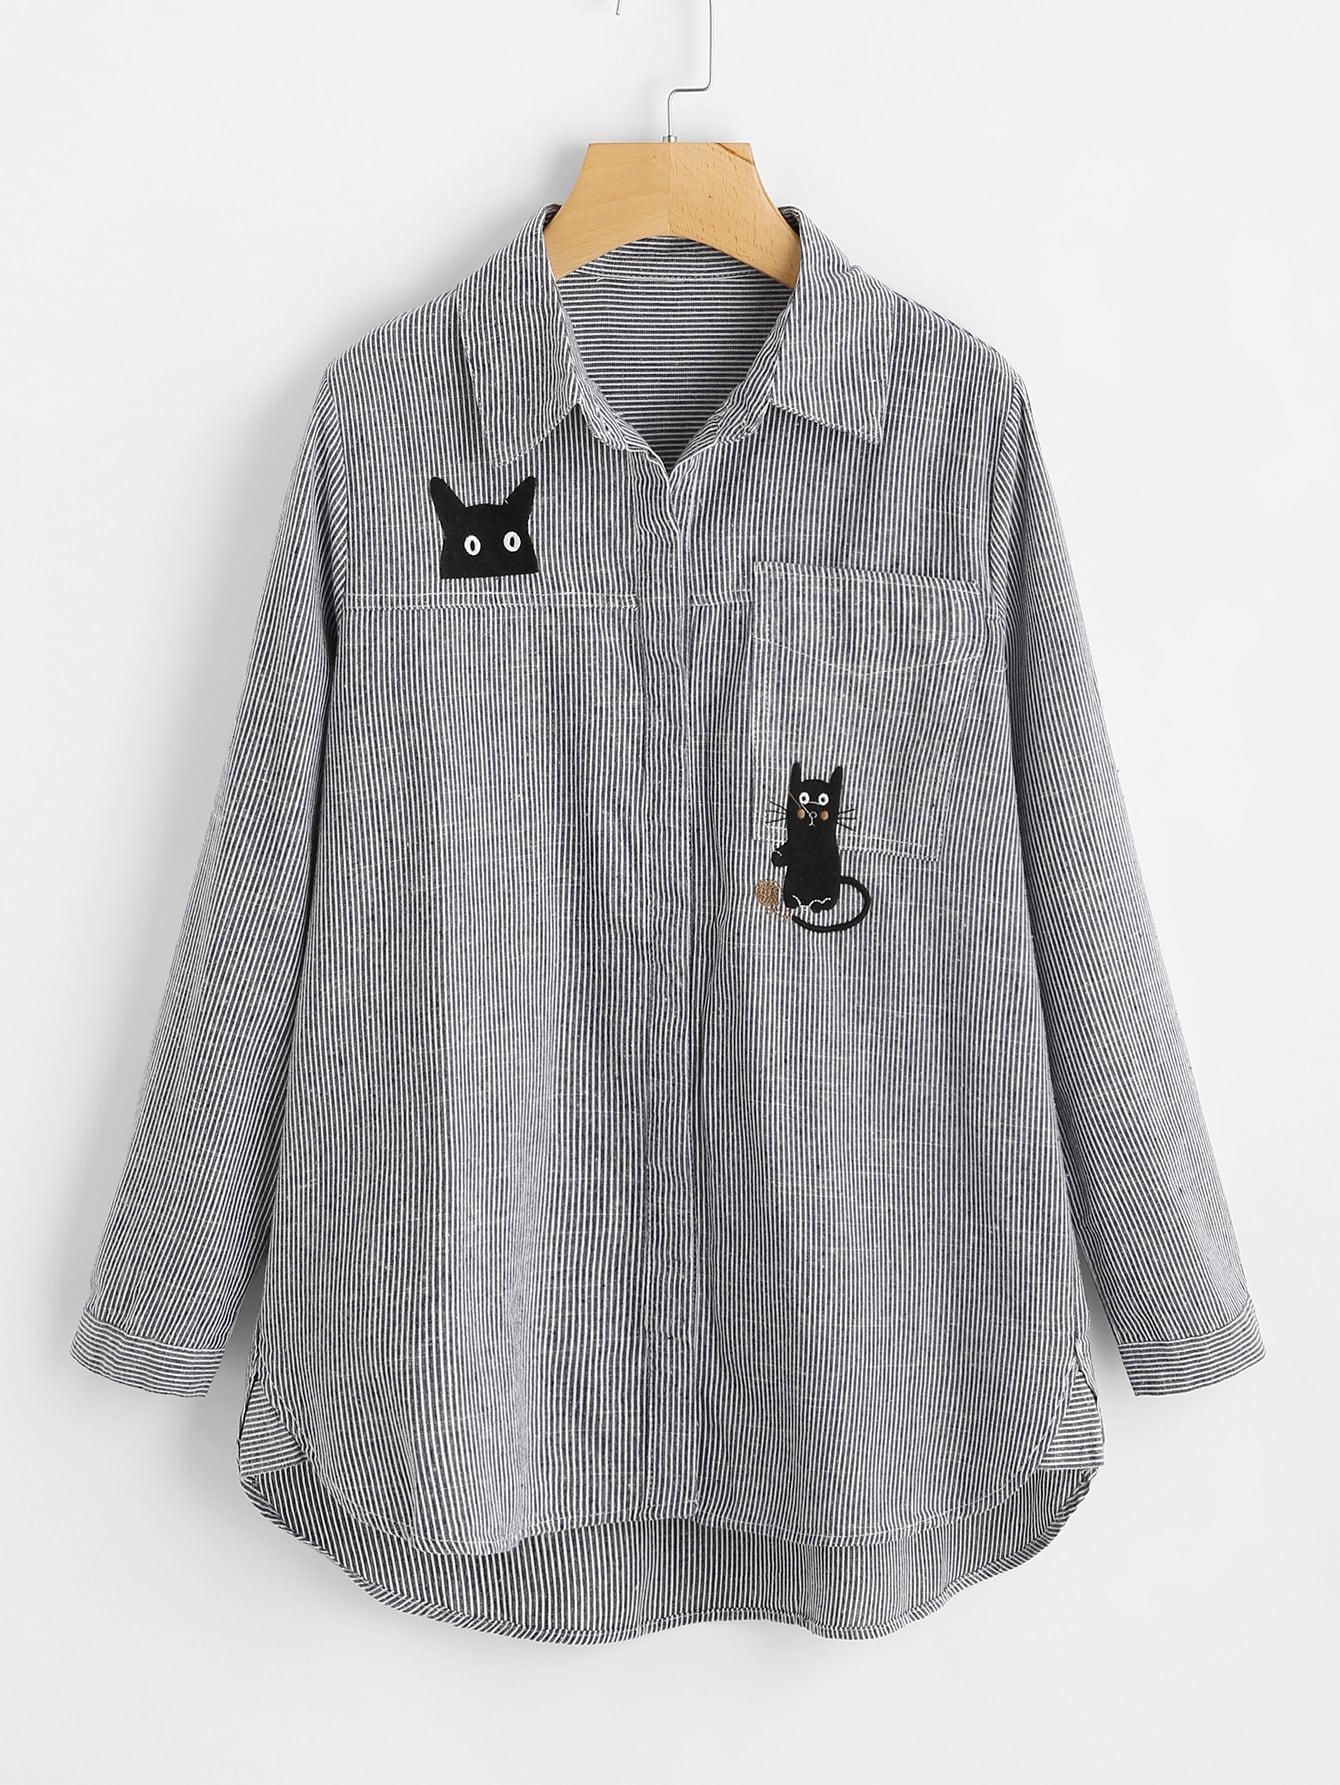 Cat Embroidery Dolphin Hem Striped Blouse embroidery tape dolphin hem bardot top